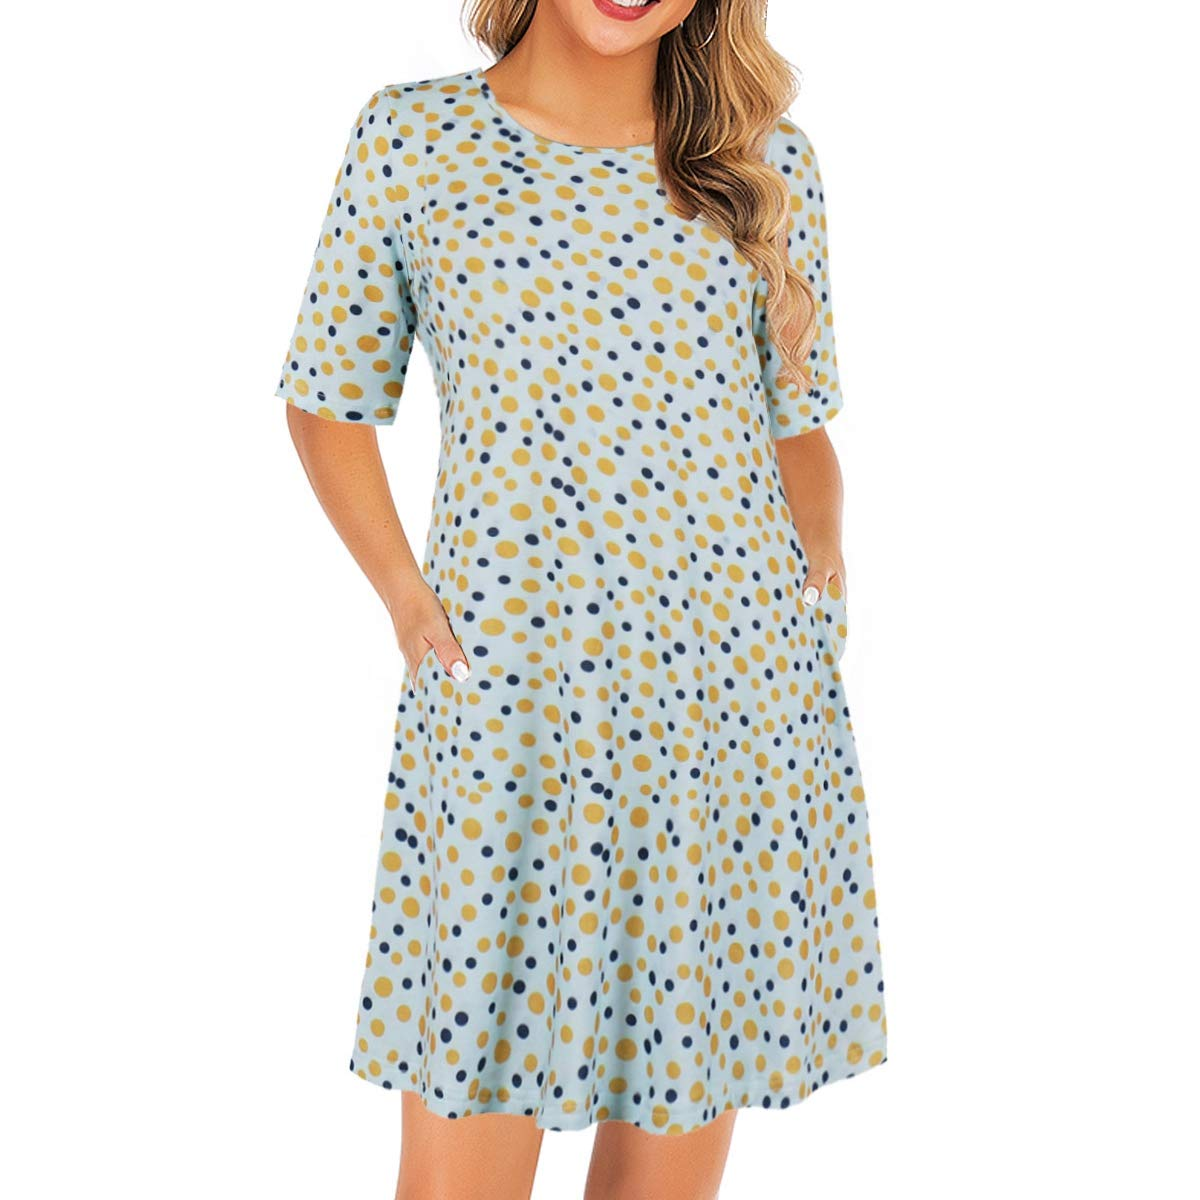 Wellwits Womens Half Sleeves Pattern Print T Shirt Swing Short Vintage Tunic Dress